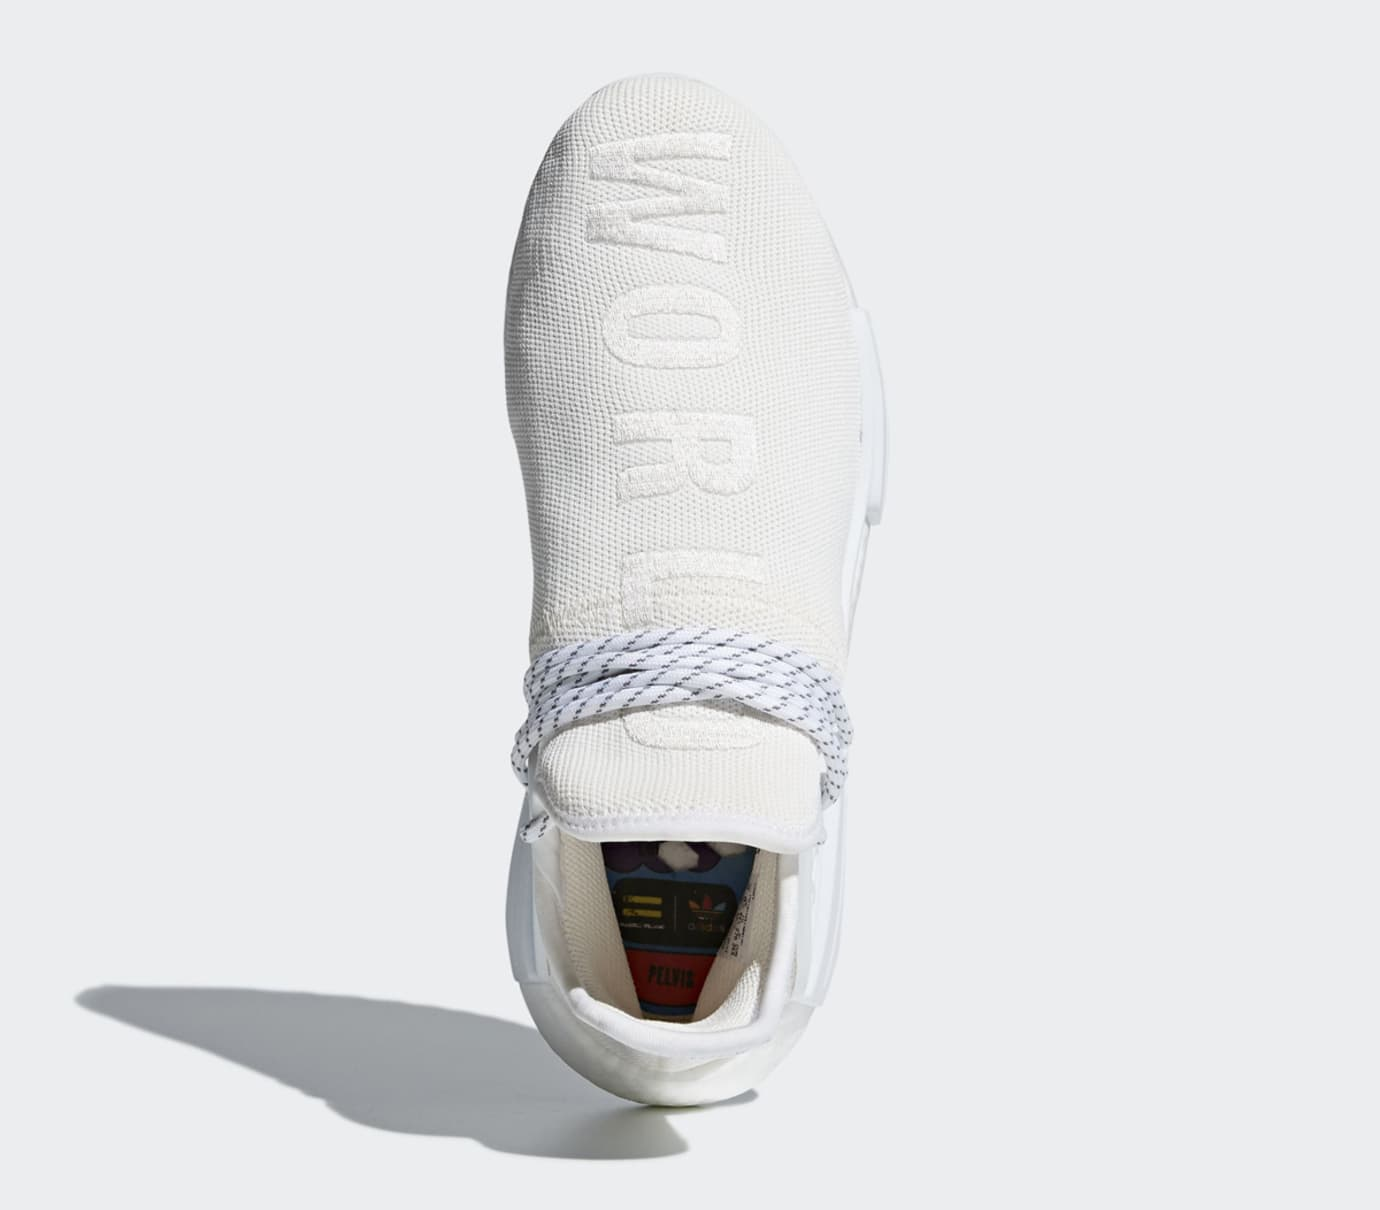 37017d969 Image via Adidas Pharrell Adidas NMD Hu Trail Blank Canvas AC7031 White Top